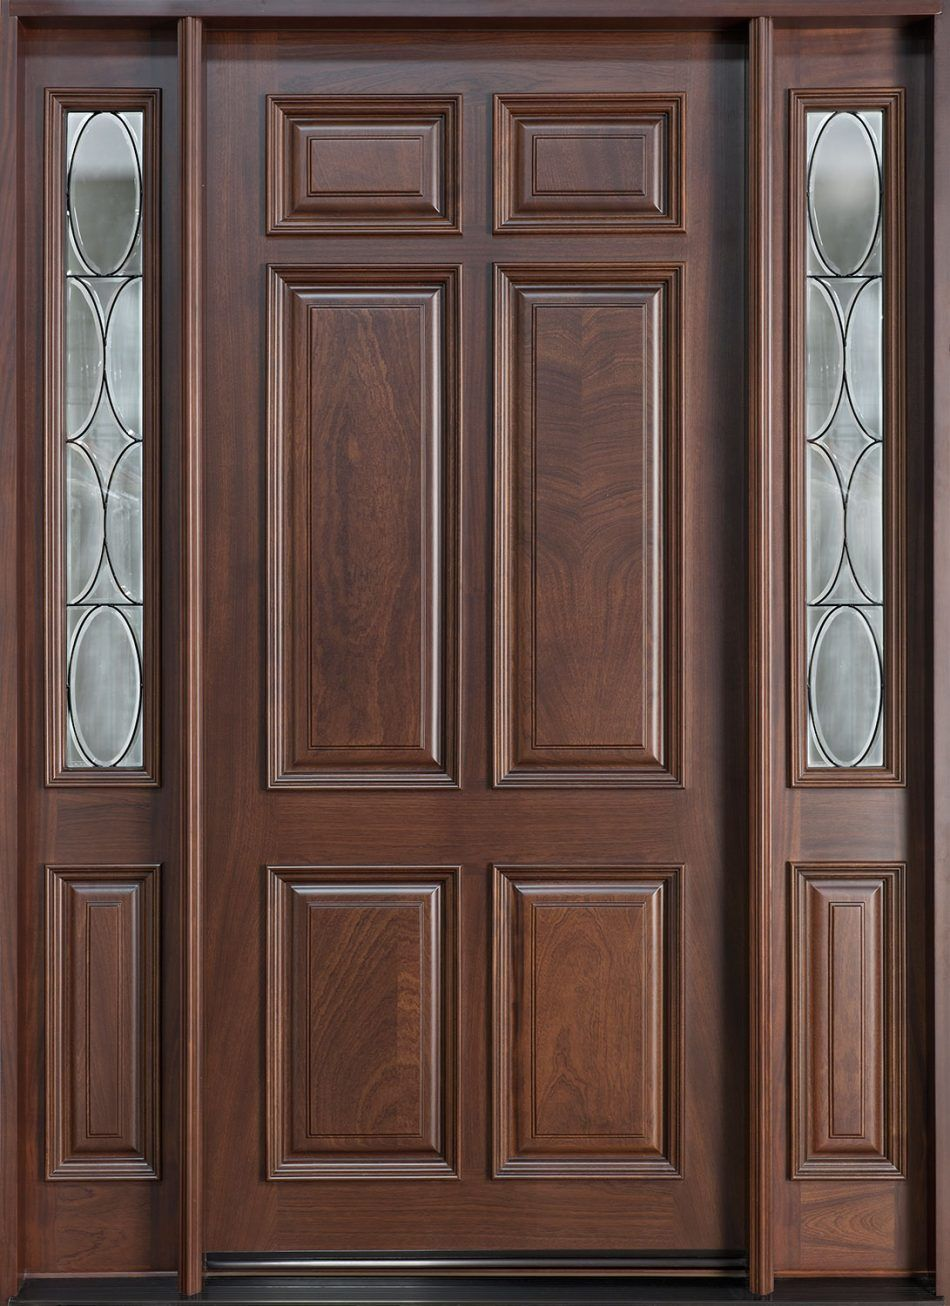 Wooden Front Doors Canada Google Search Cửa Trước Cửa Sổ Nghề Mộc